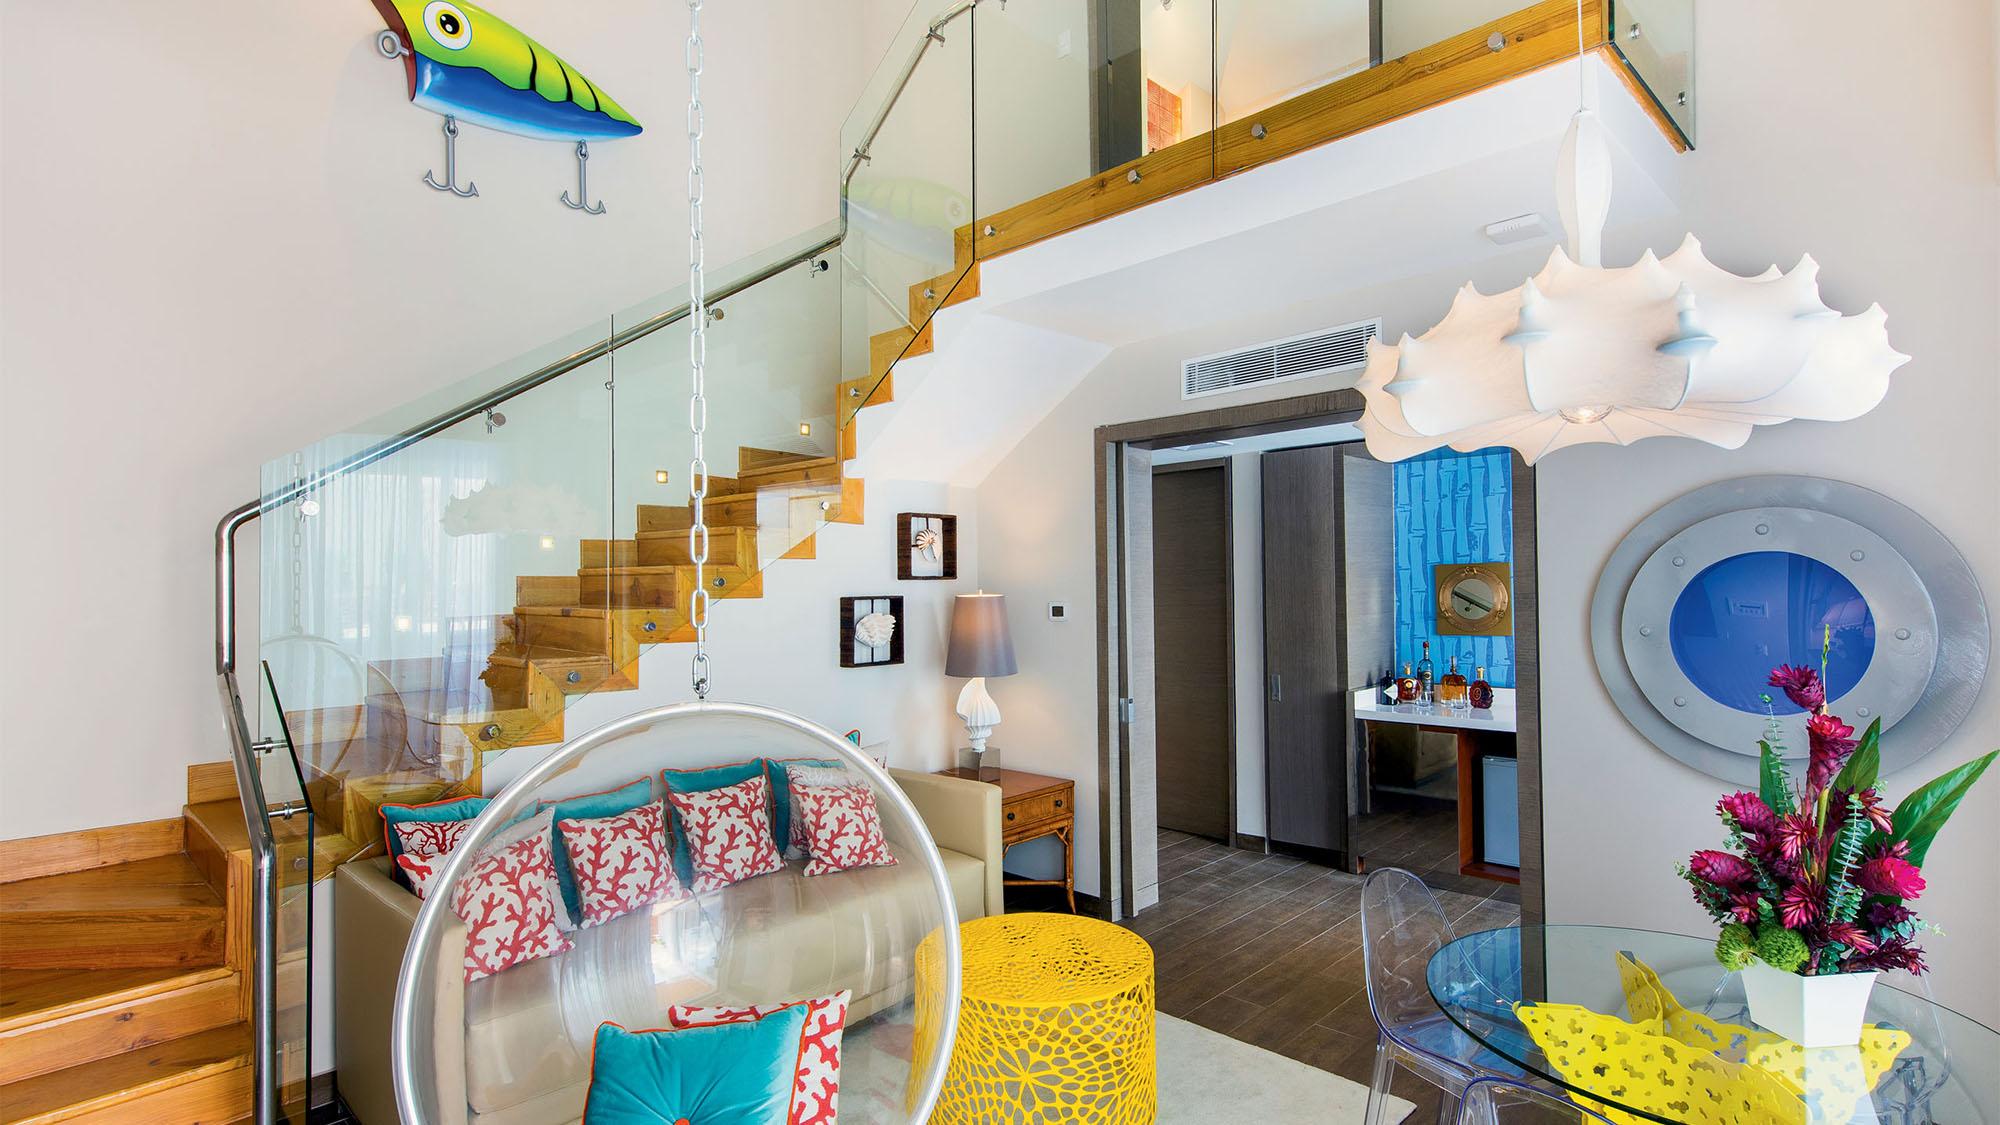 Spongebob Squarepants Villa Open At Nick Resort In